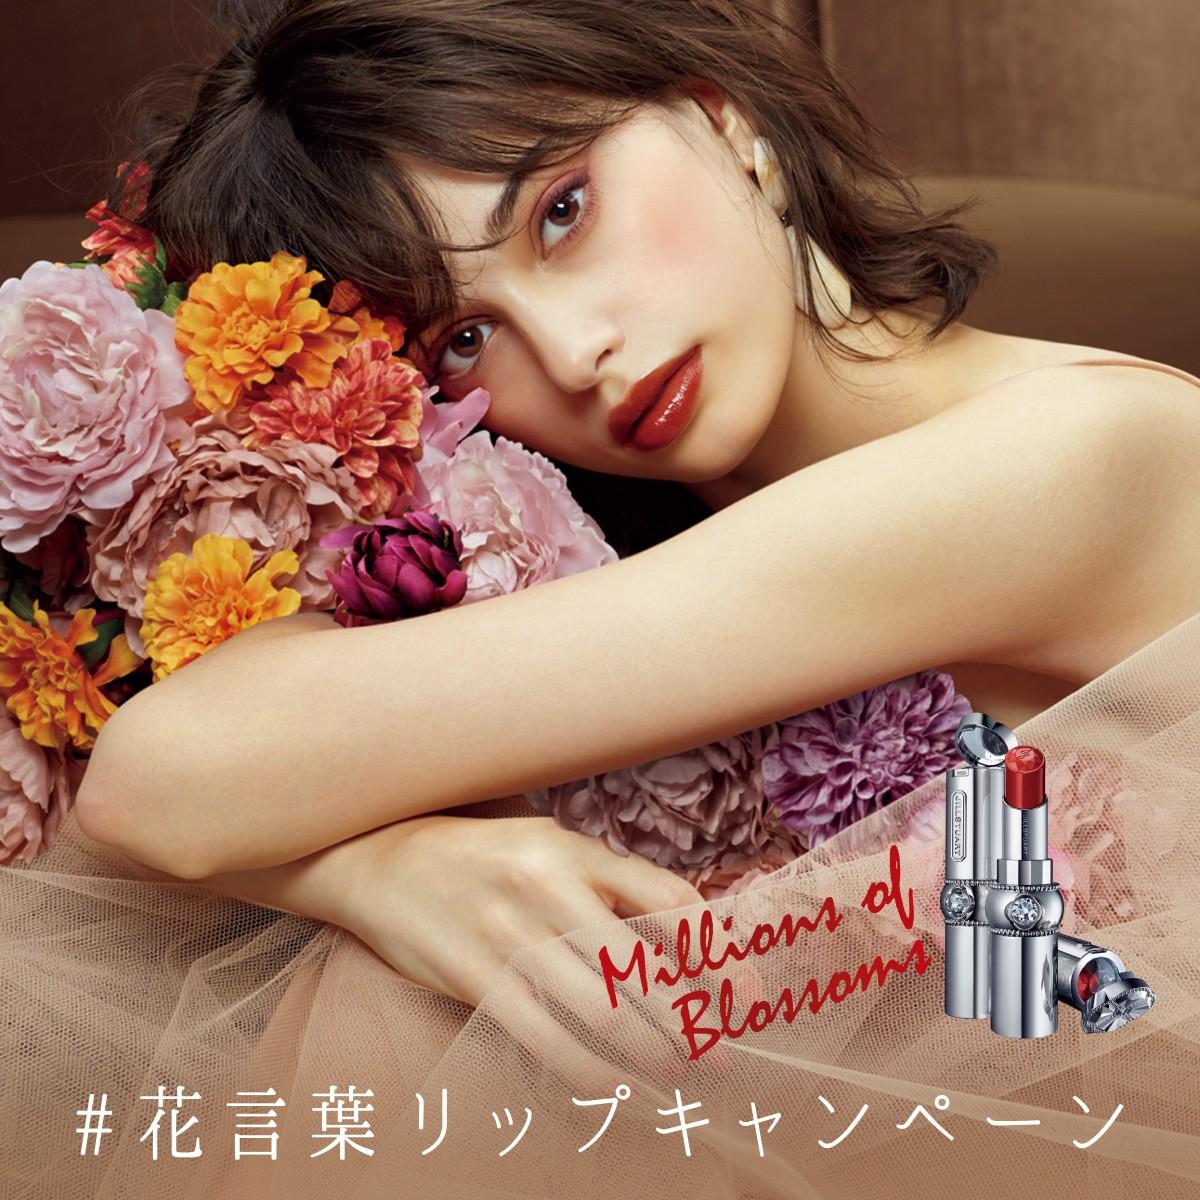 【JILL STUART15年目の魔法】唇、ツヤめく花びら色に。Newリップスティックで、なりたい私_13